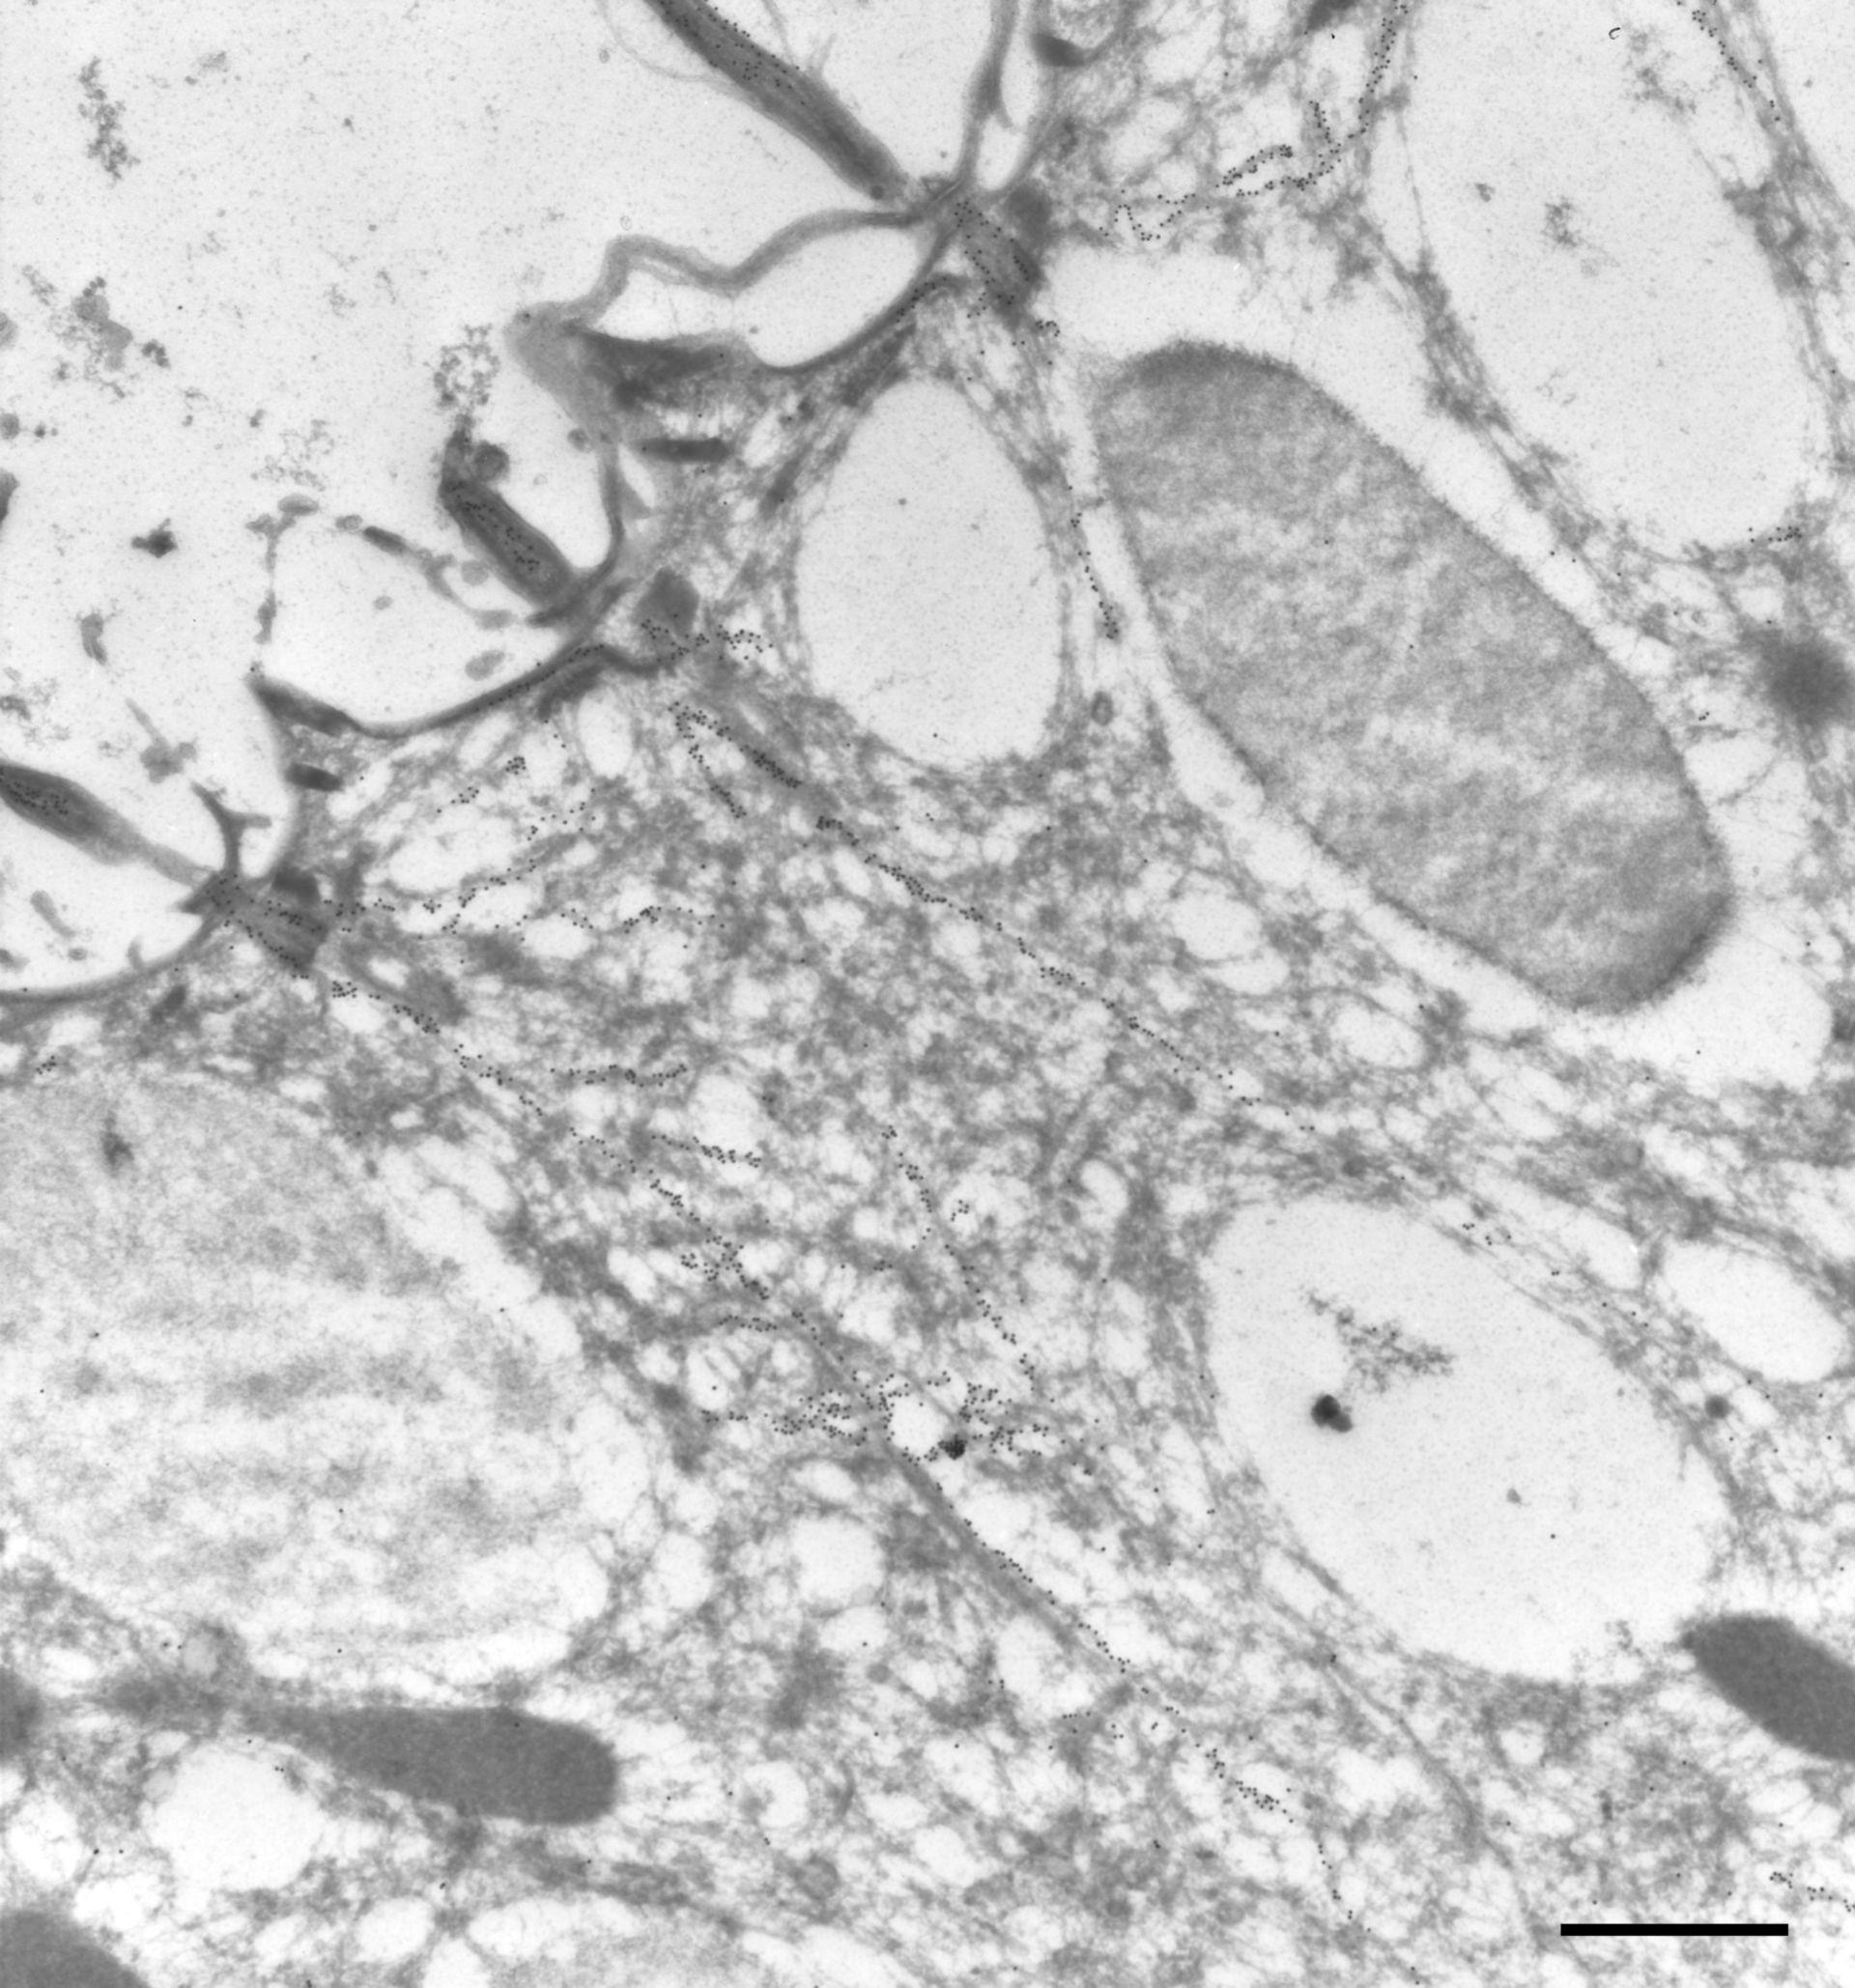 Paramecium tetraurelia (Microtubule basal body) - CIL:9846